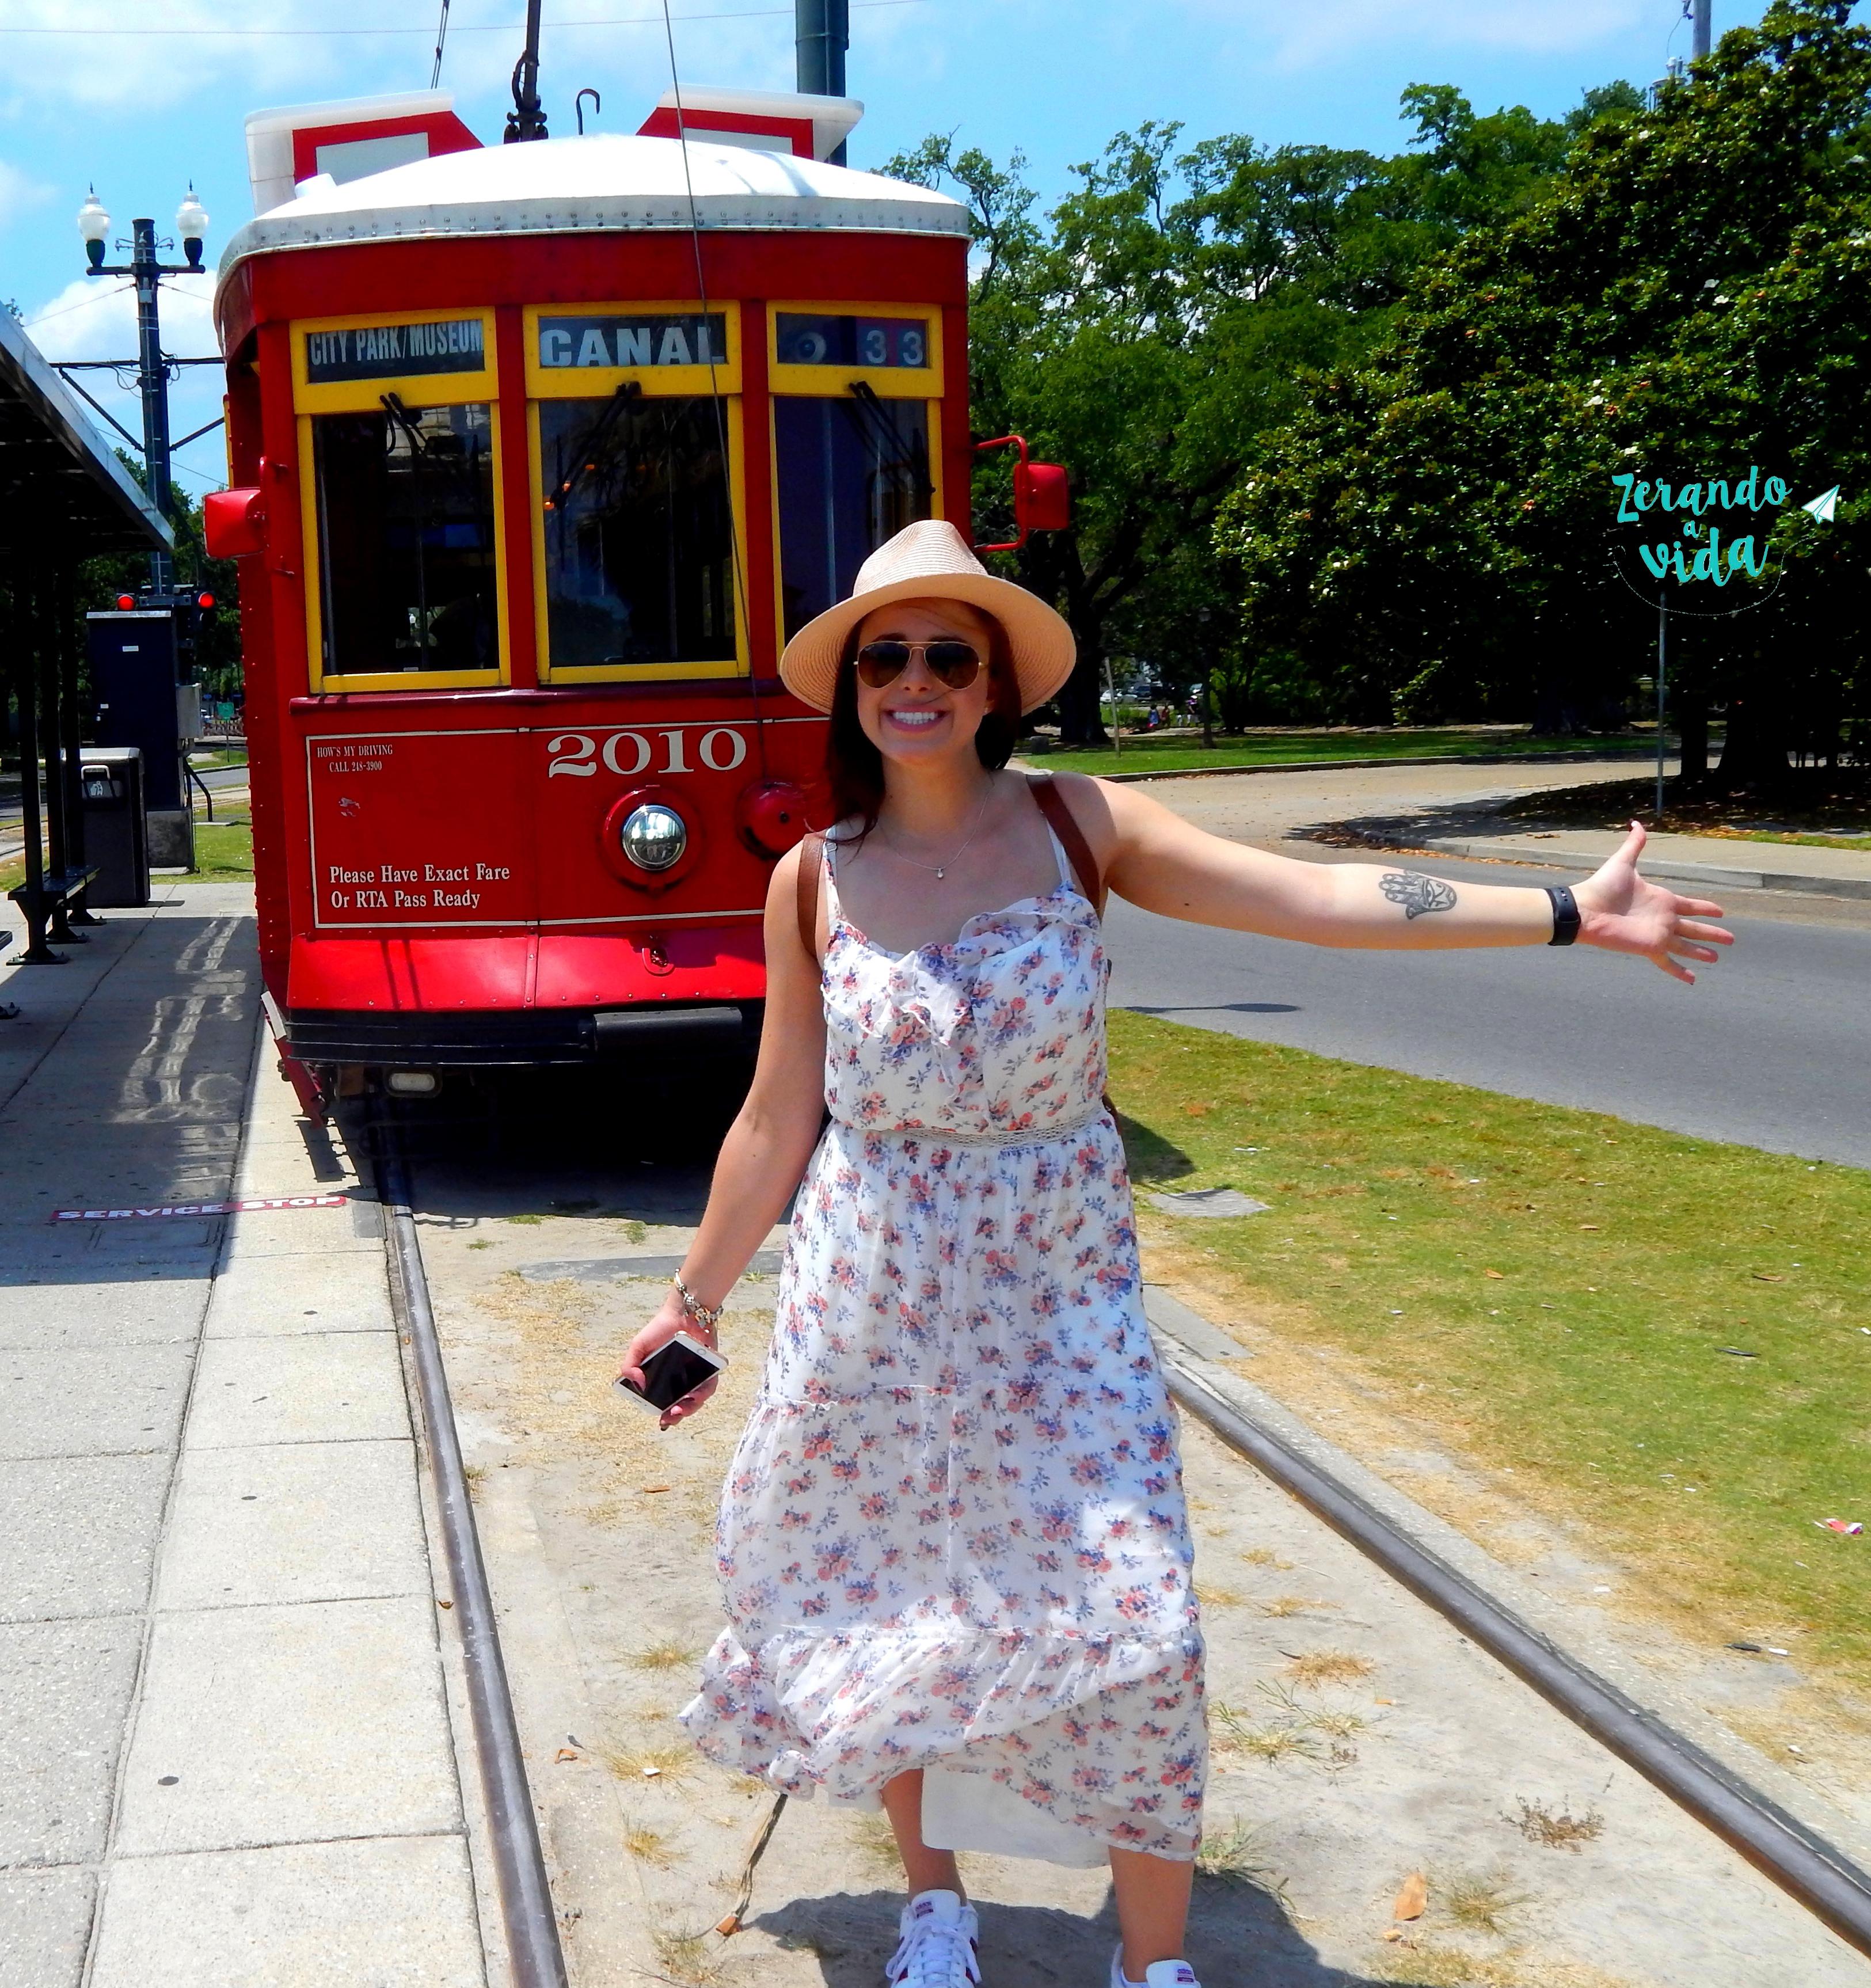 City Park New Orleans Louisiana